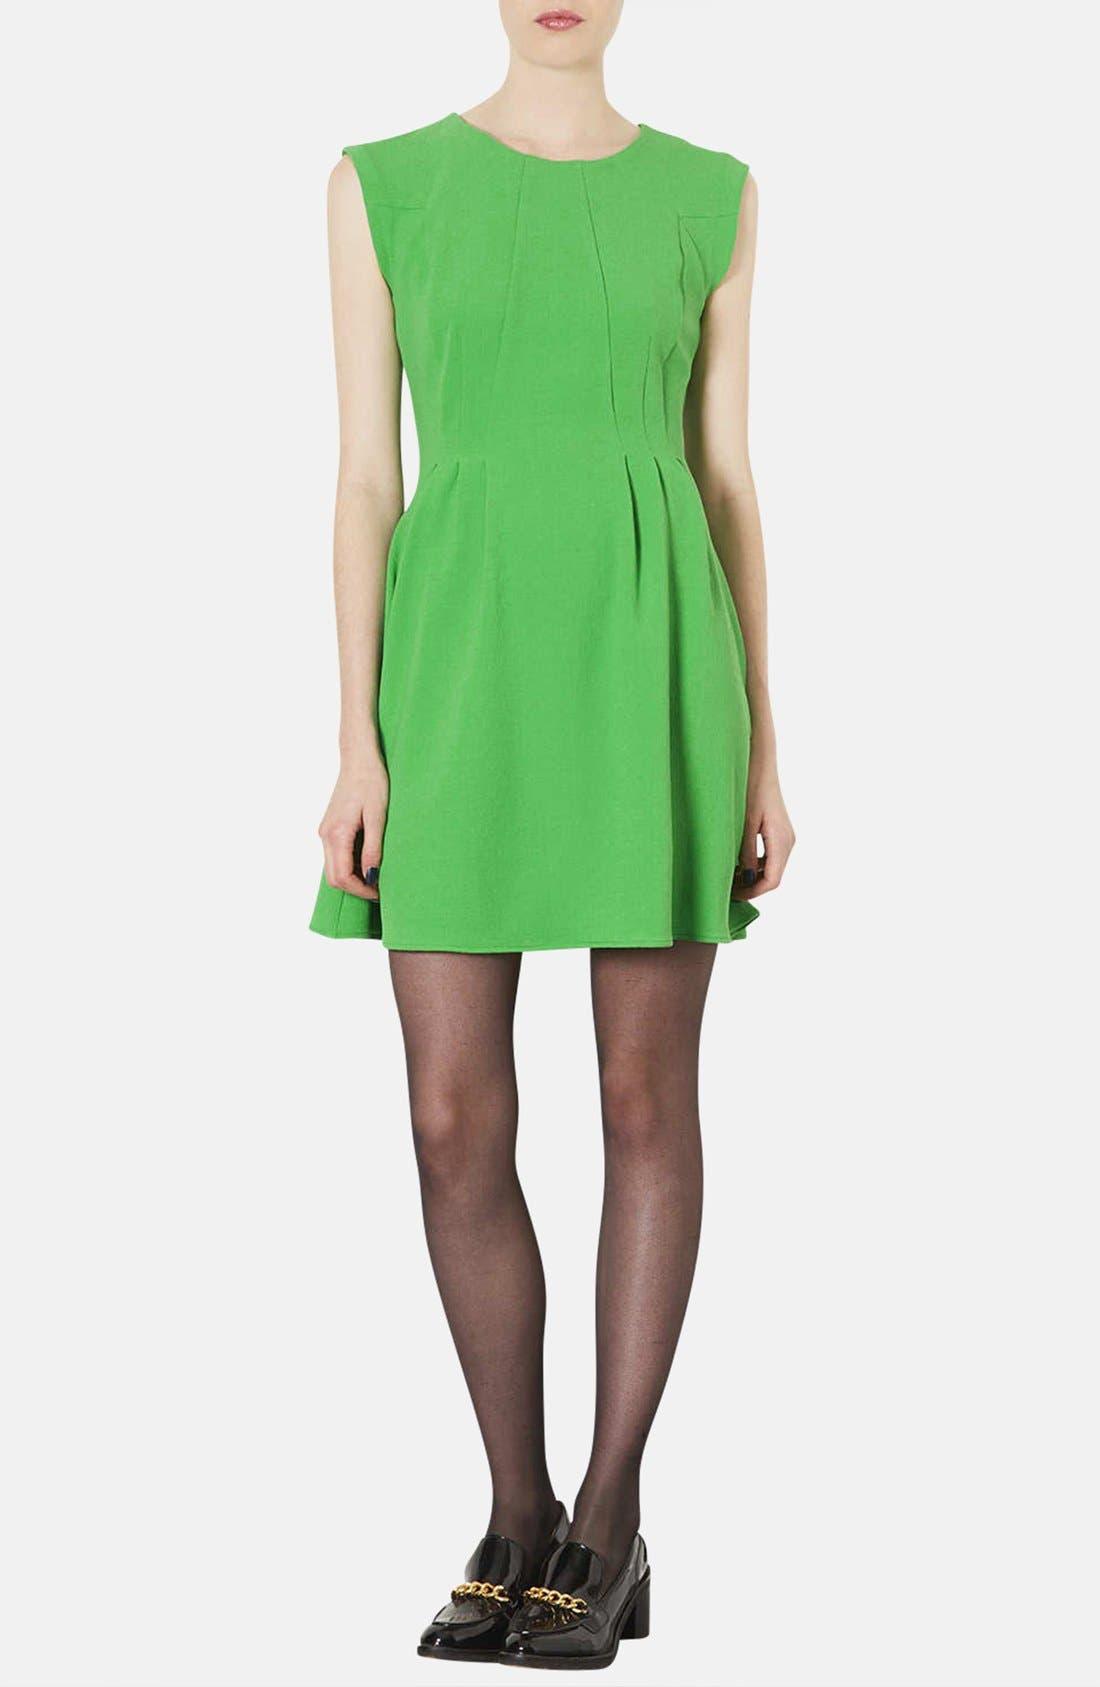 Alternate Image 1 Selected - Topshop Crepe Fit & Flare Dress